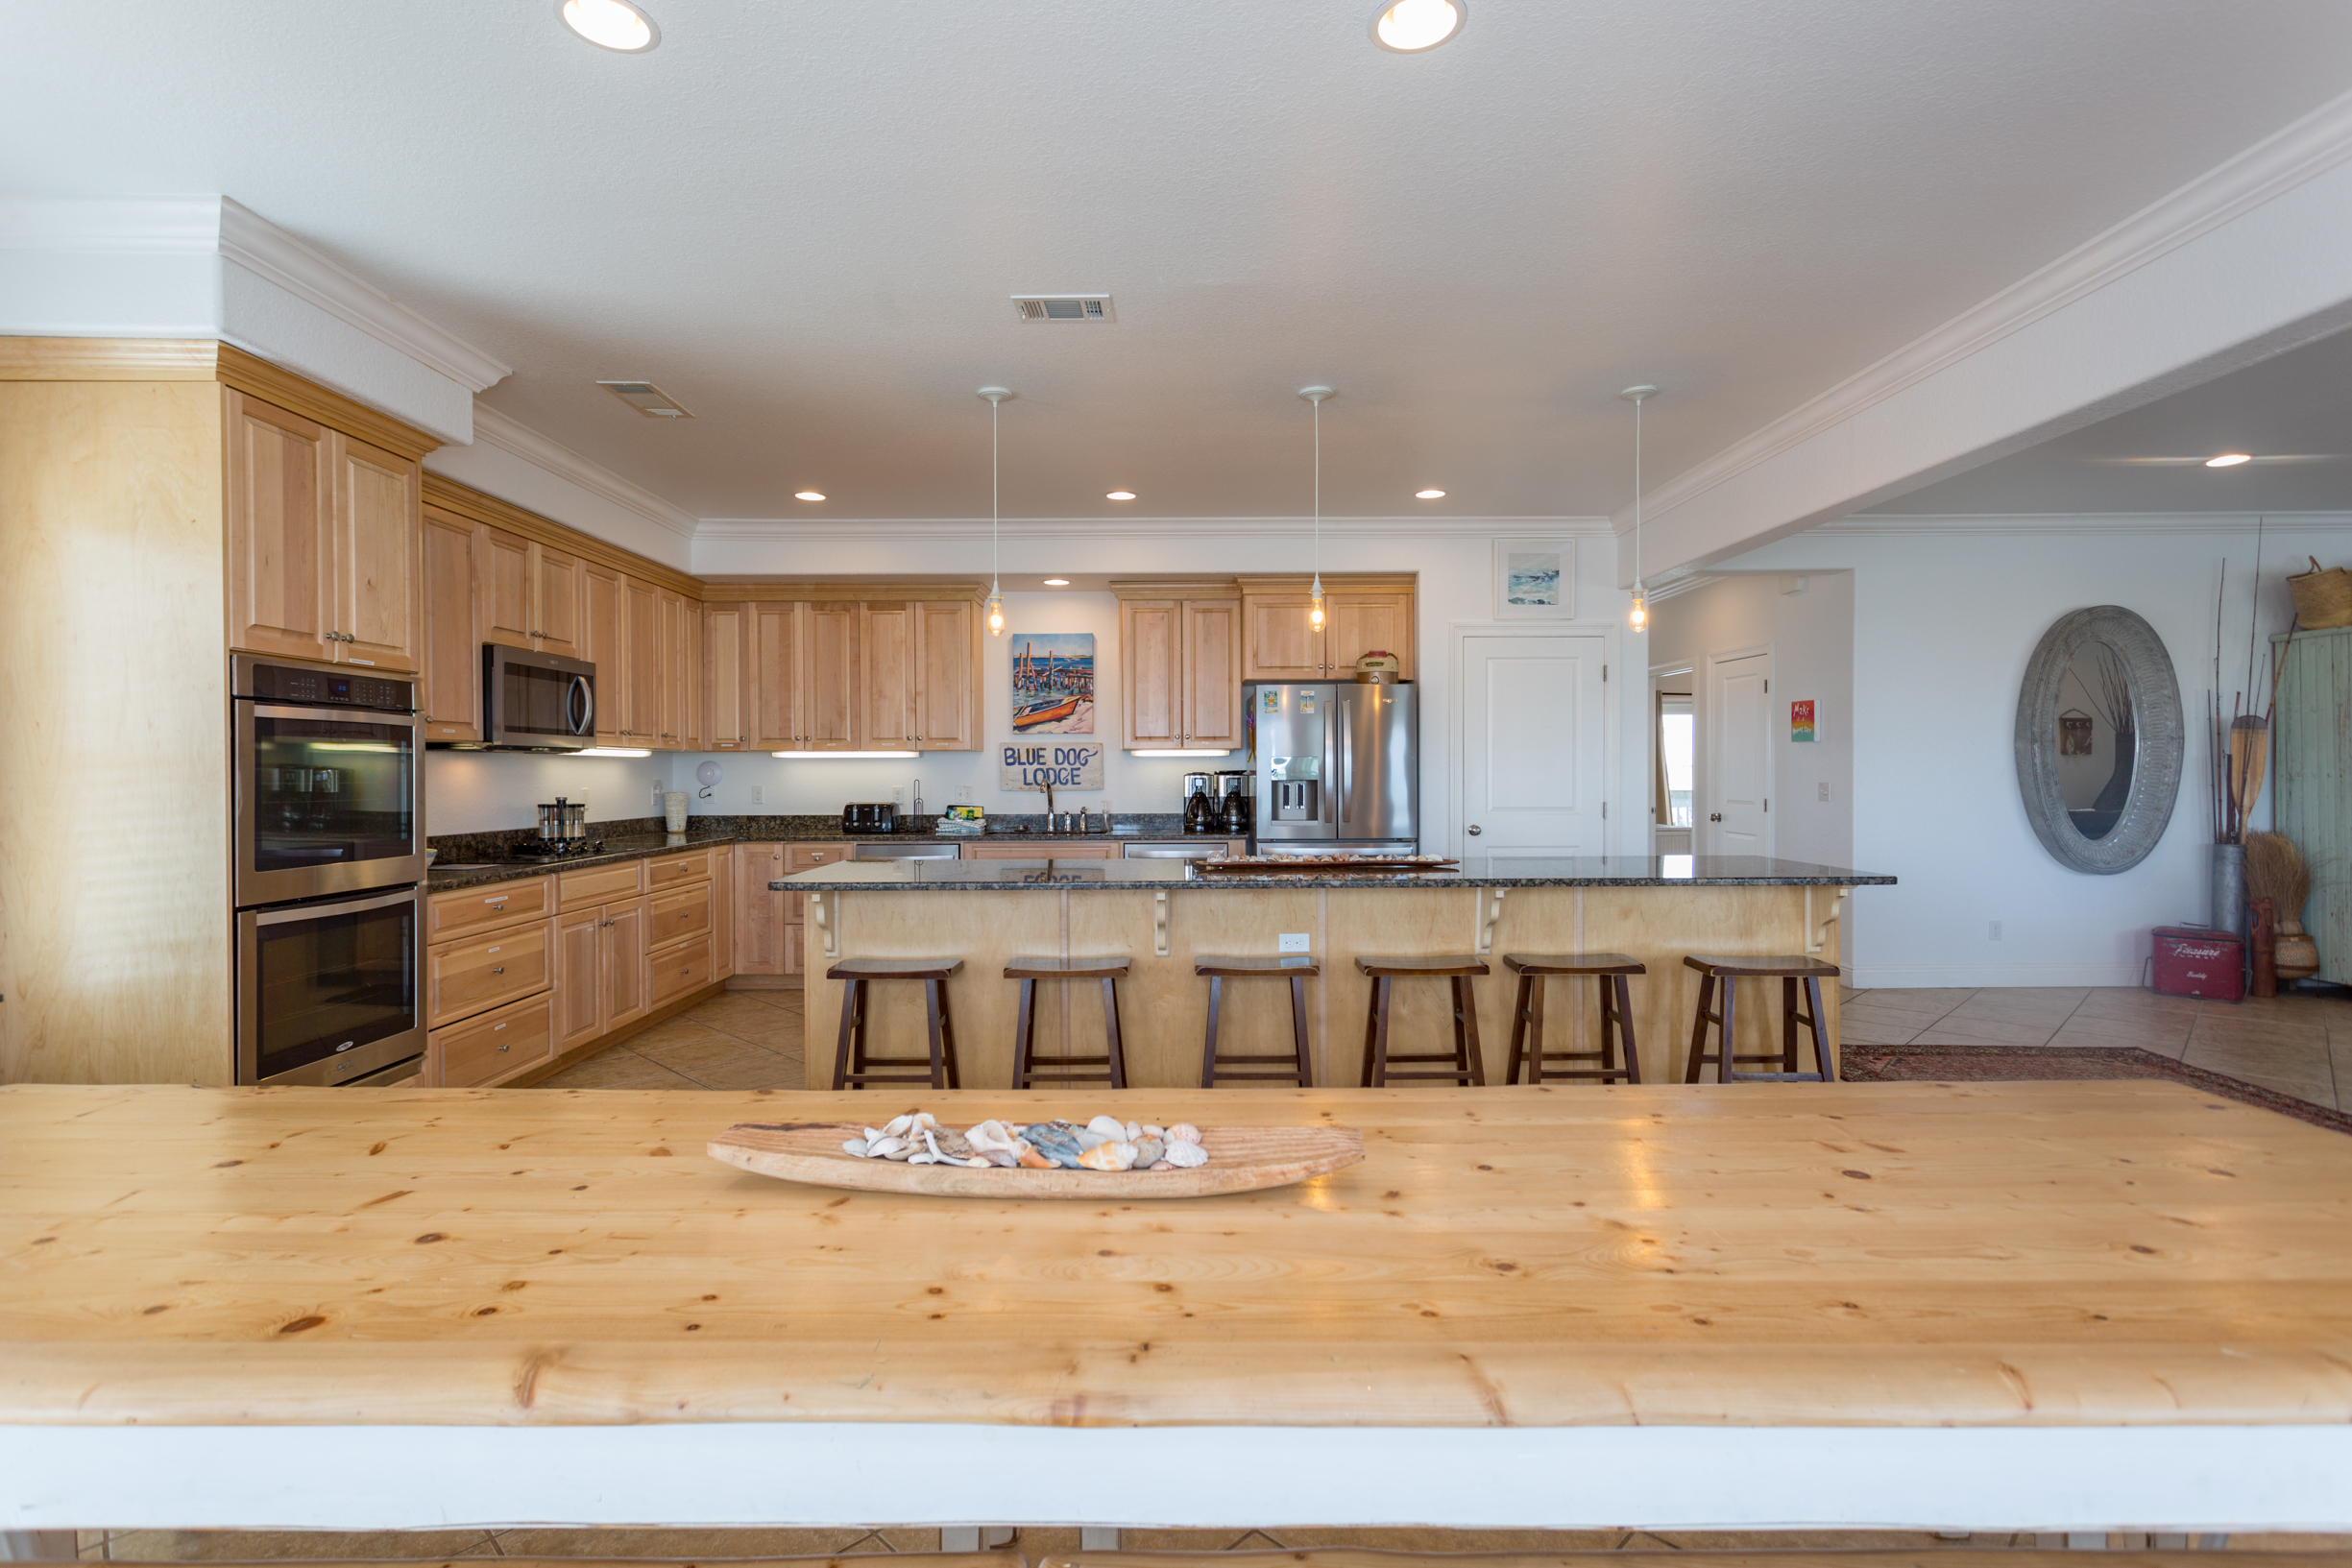 Ariola 1003 - The Starfish House House/Cottage rental in Pensacola Beach House Rentals in Pensacola Beach Florida - #14